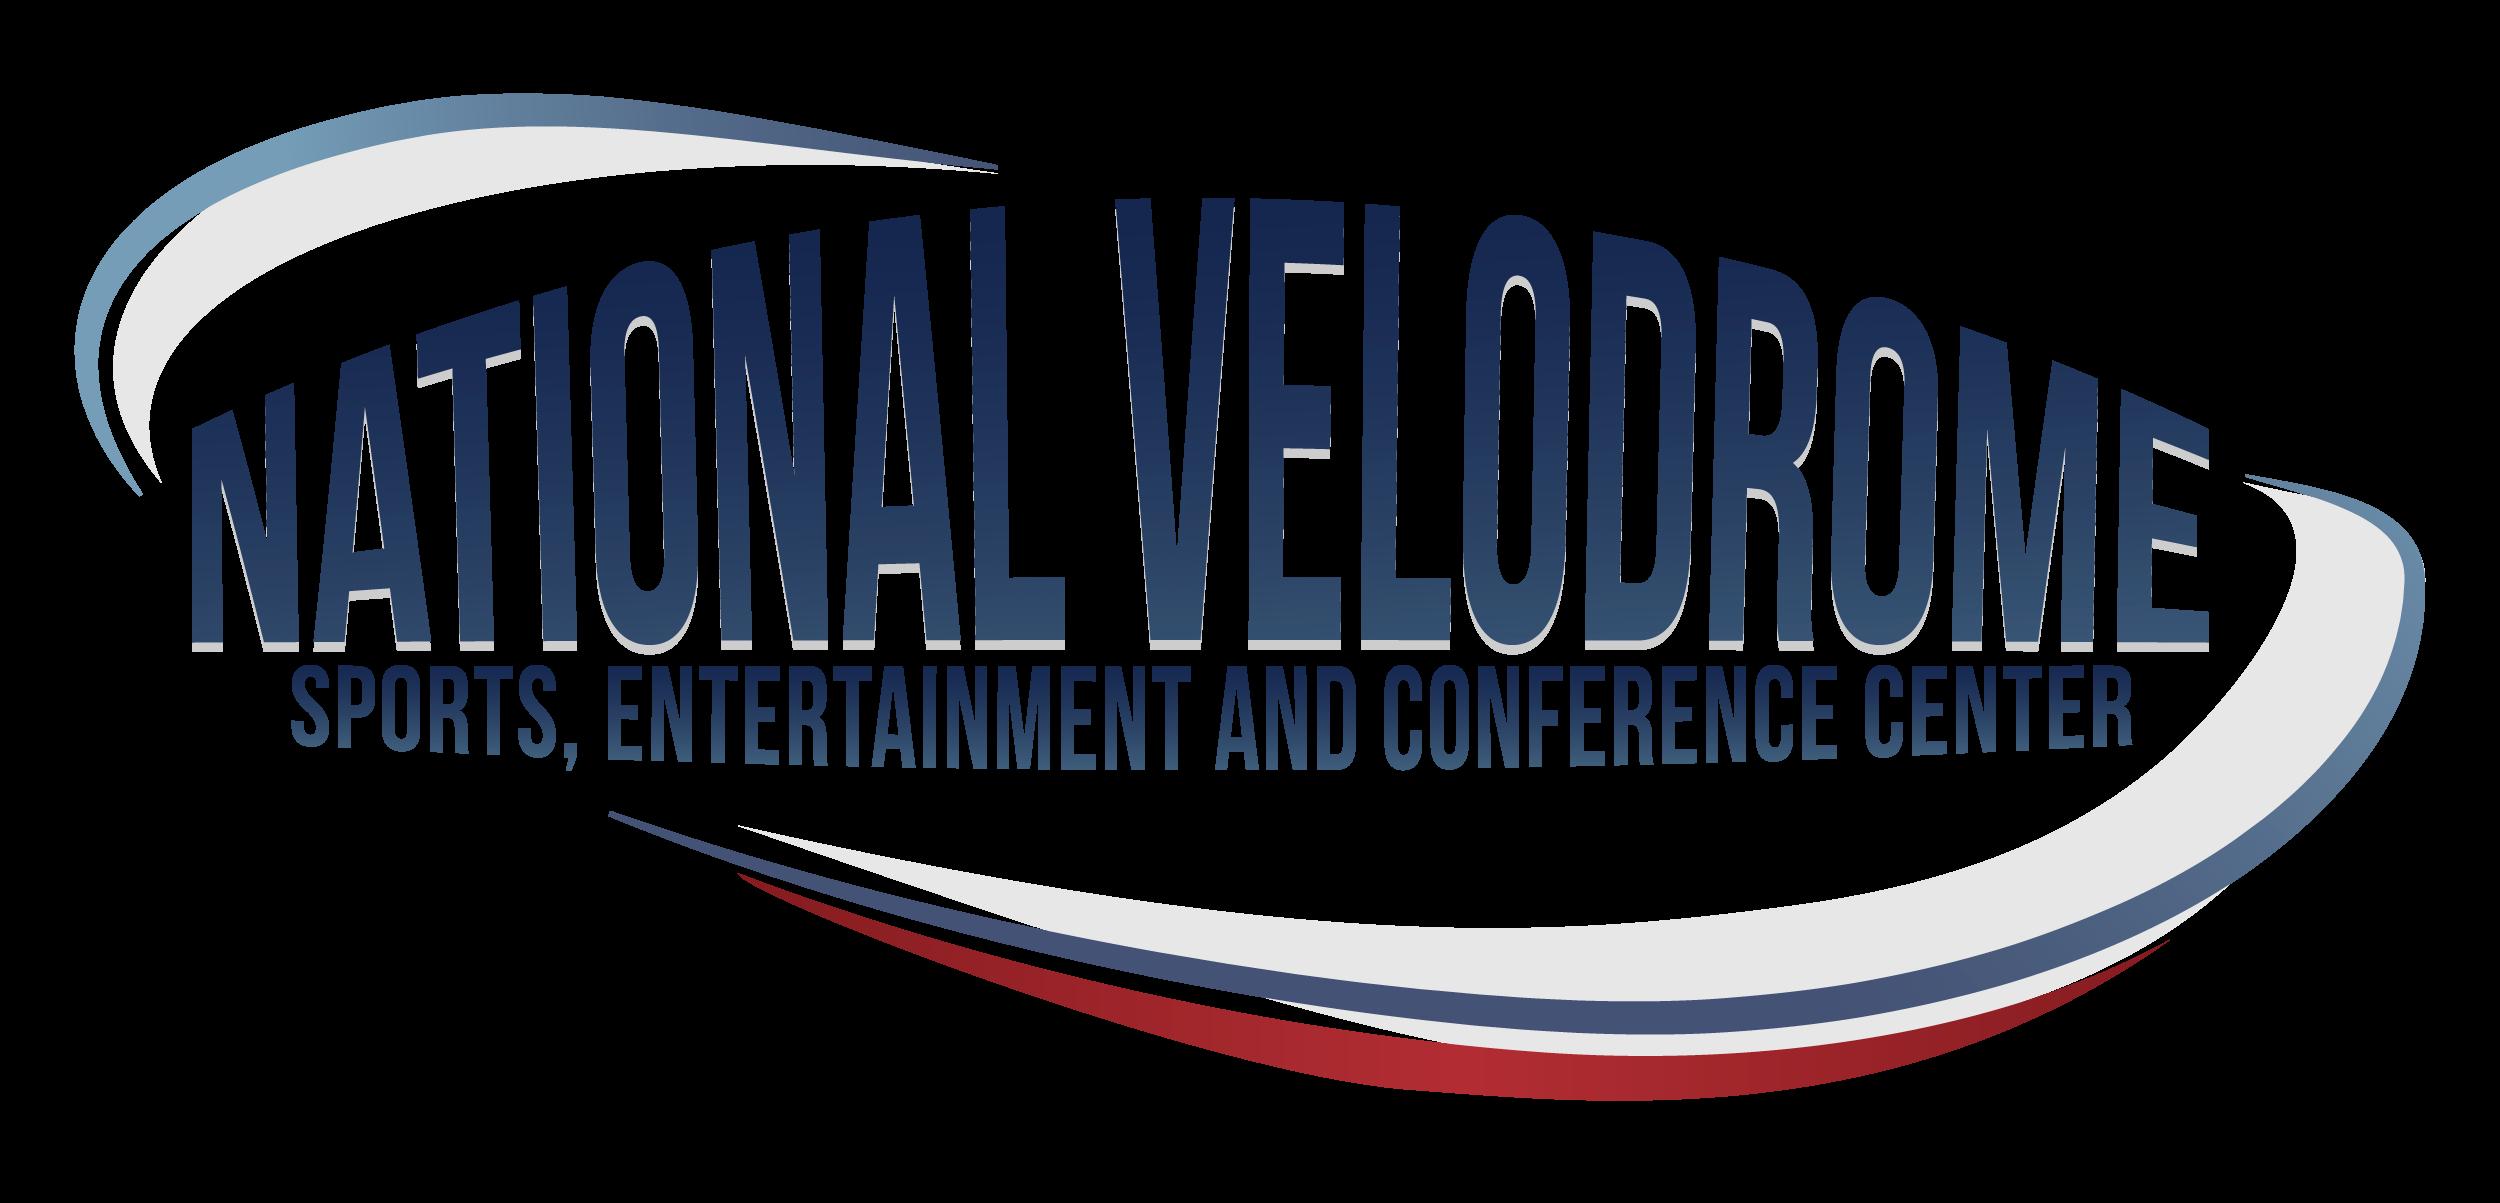 National Velodrome